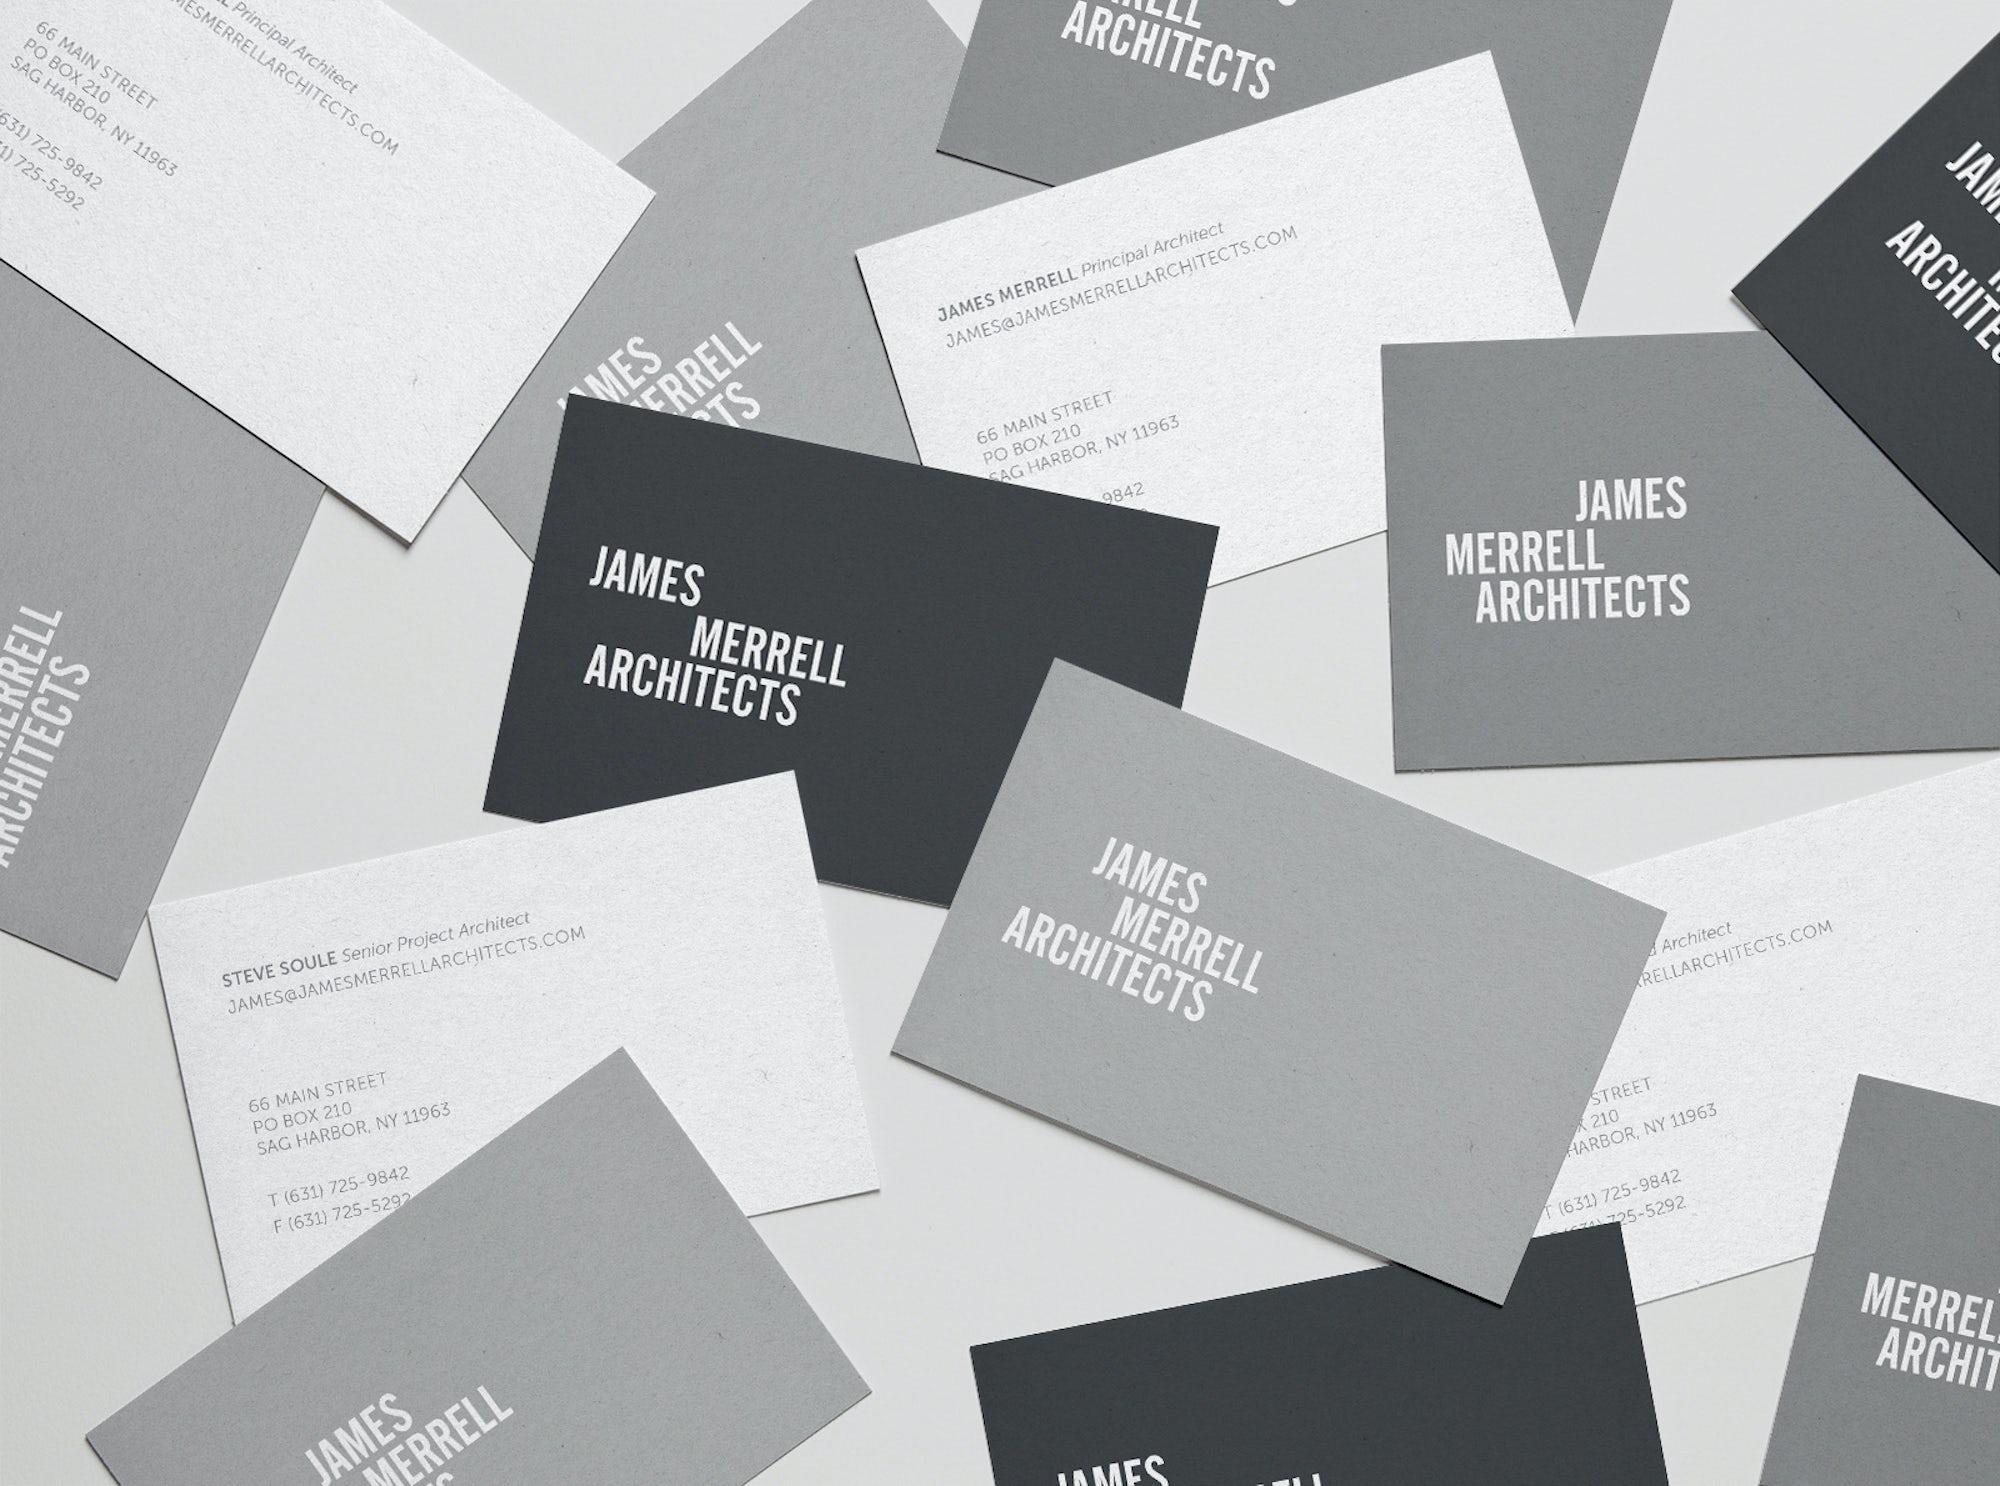 James Merrell Architects Logo Design